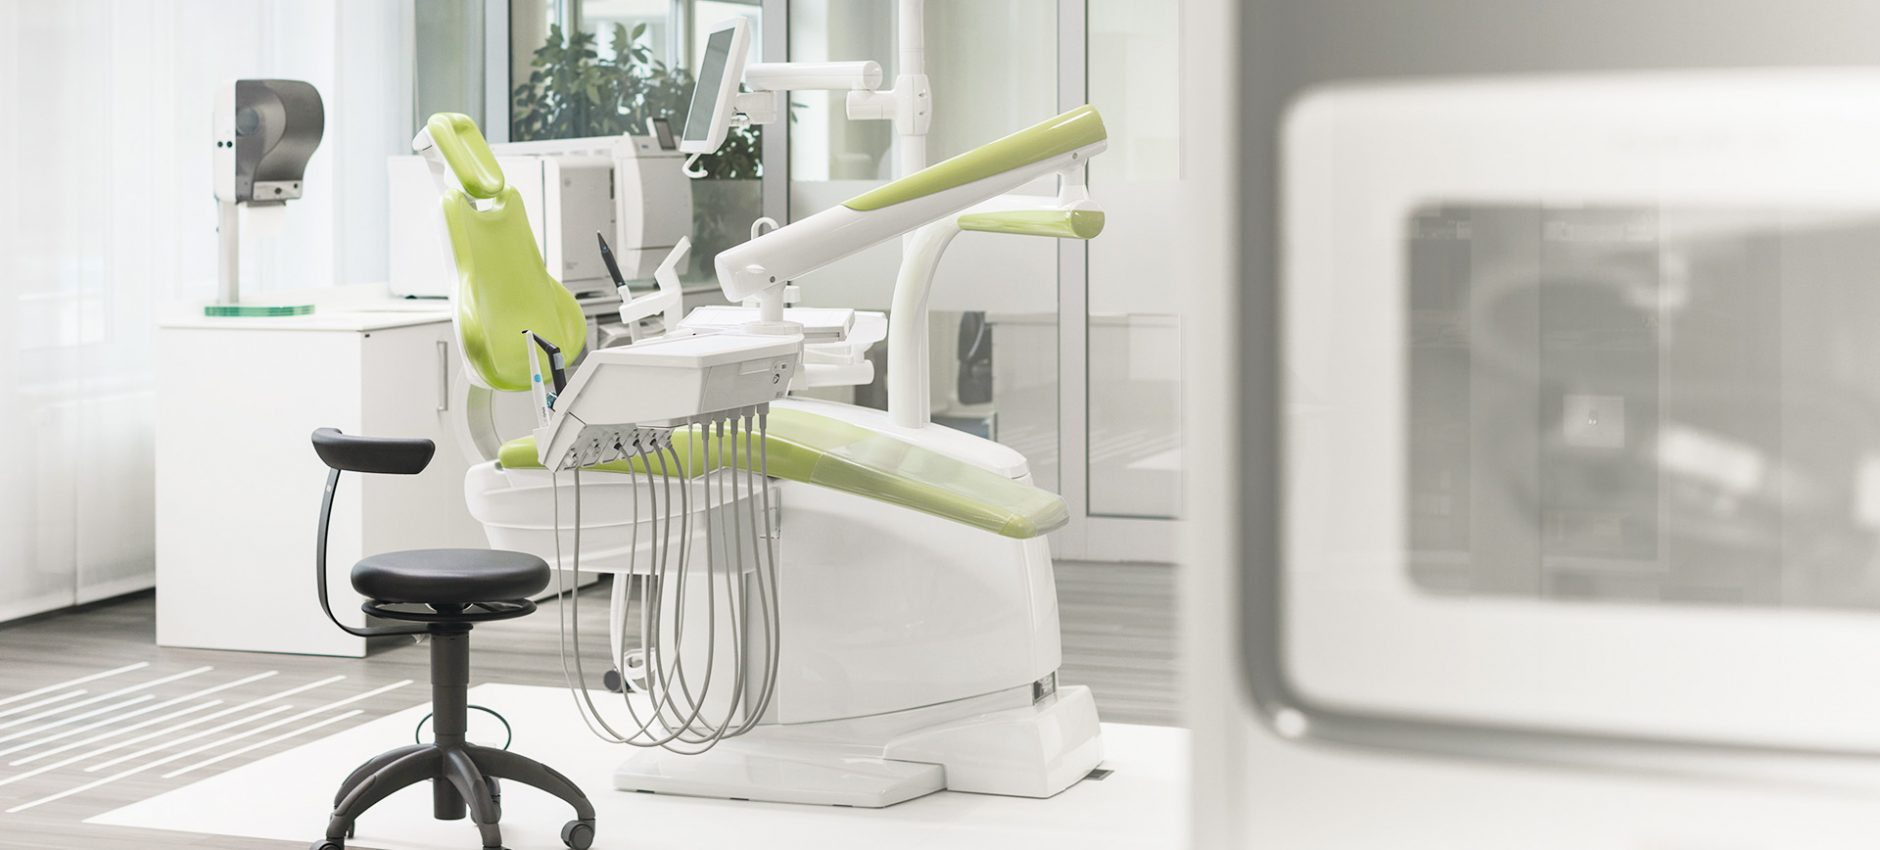 0015_GERL_DentalShowroom_Zaehne_BehandlungStuhl_1920x1000_72dpi.jpg